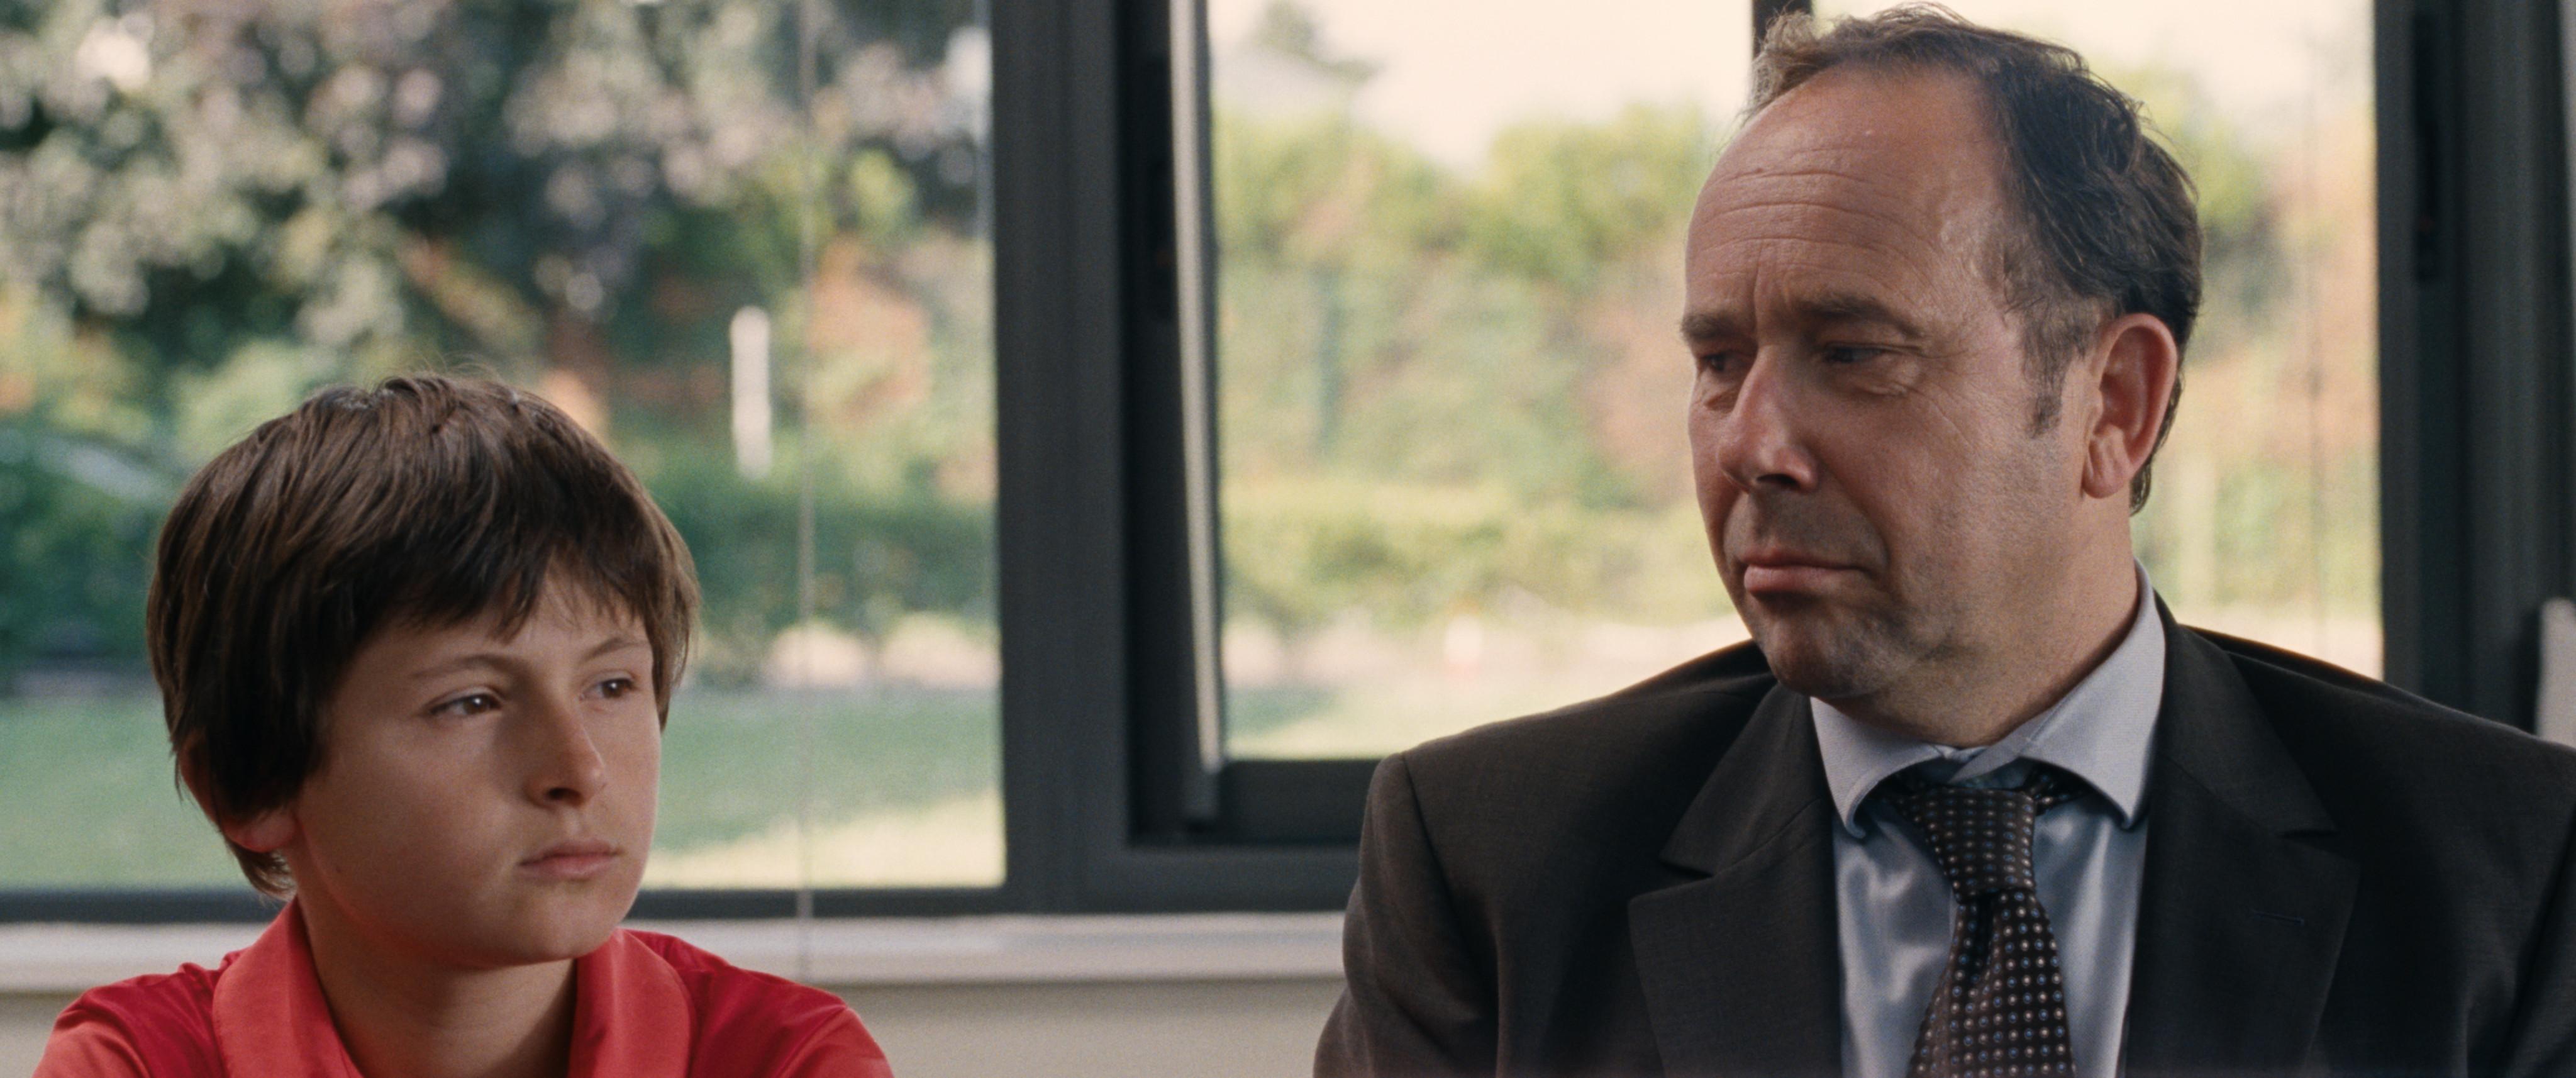 Terre battue: Olivier Gourmet col giovane Charles Mérienne in una scena del film